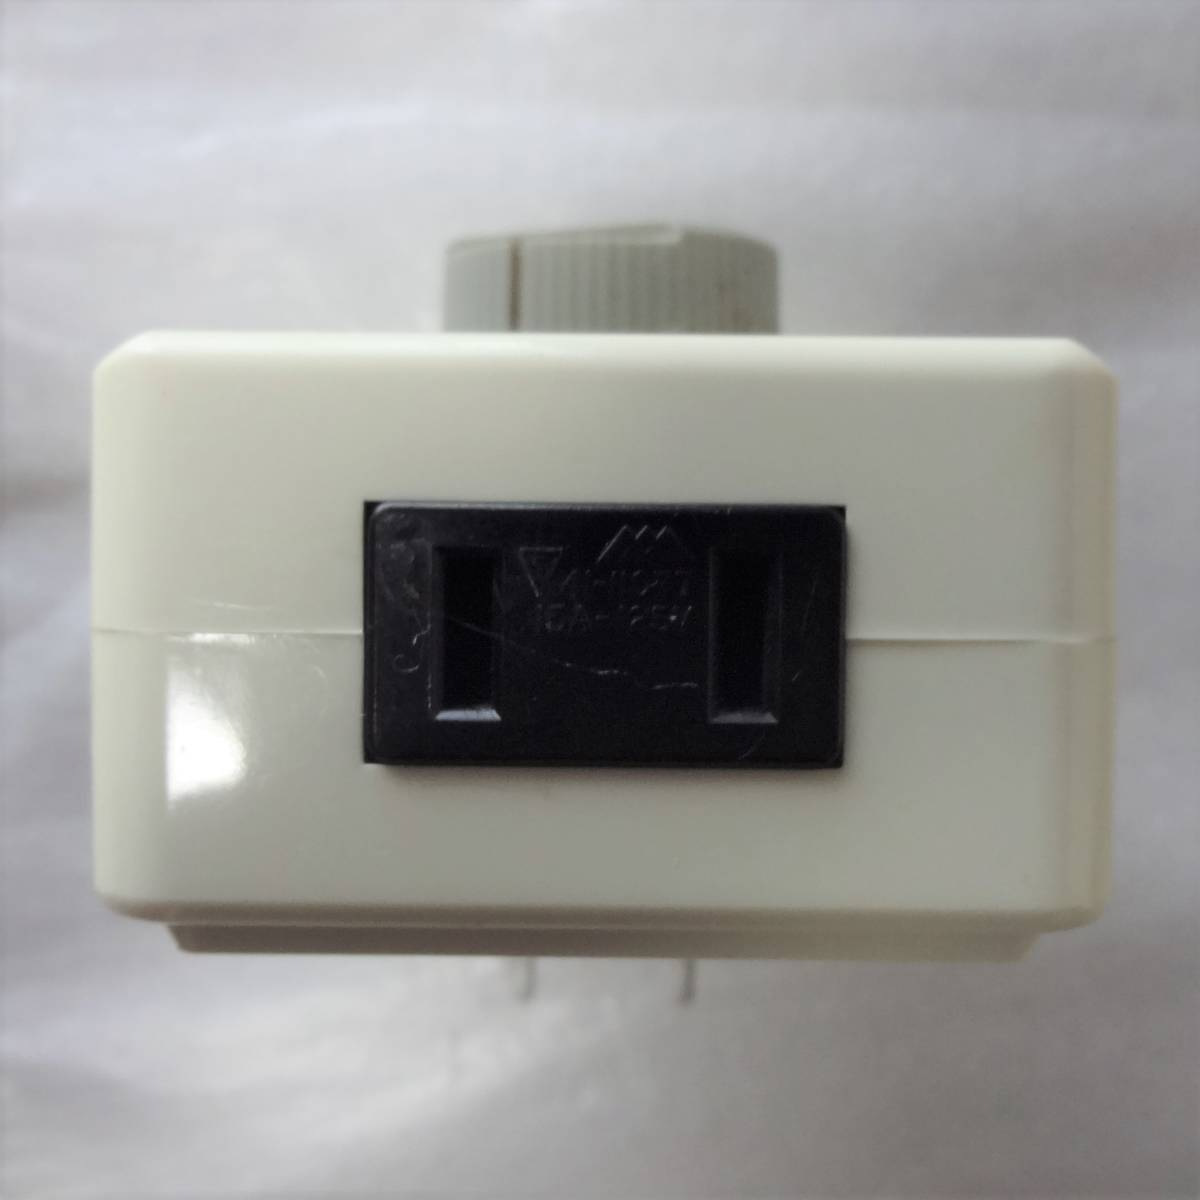 goot / 太洋電気産業 ライトコントローラー PC-30 廃番商品 半田ごてや白熱電球に対応_画像3